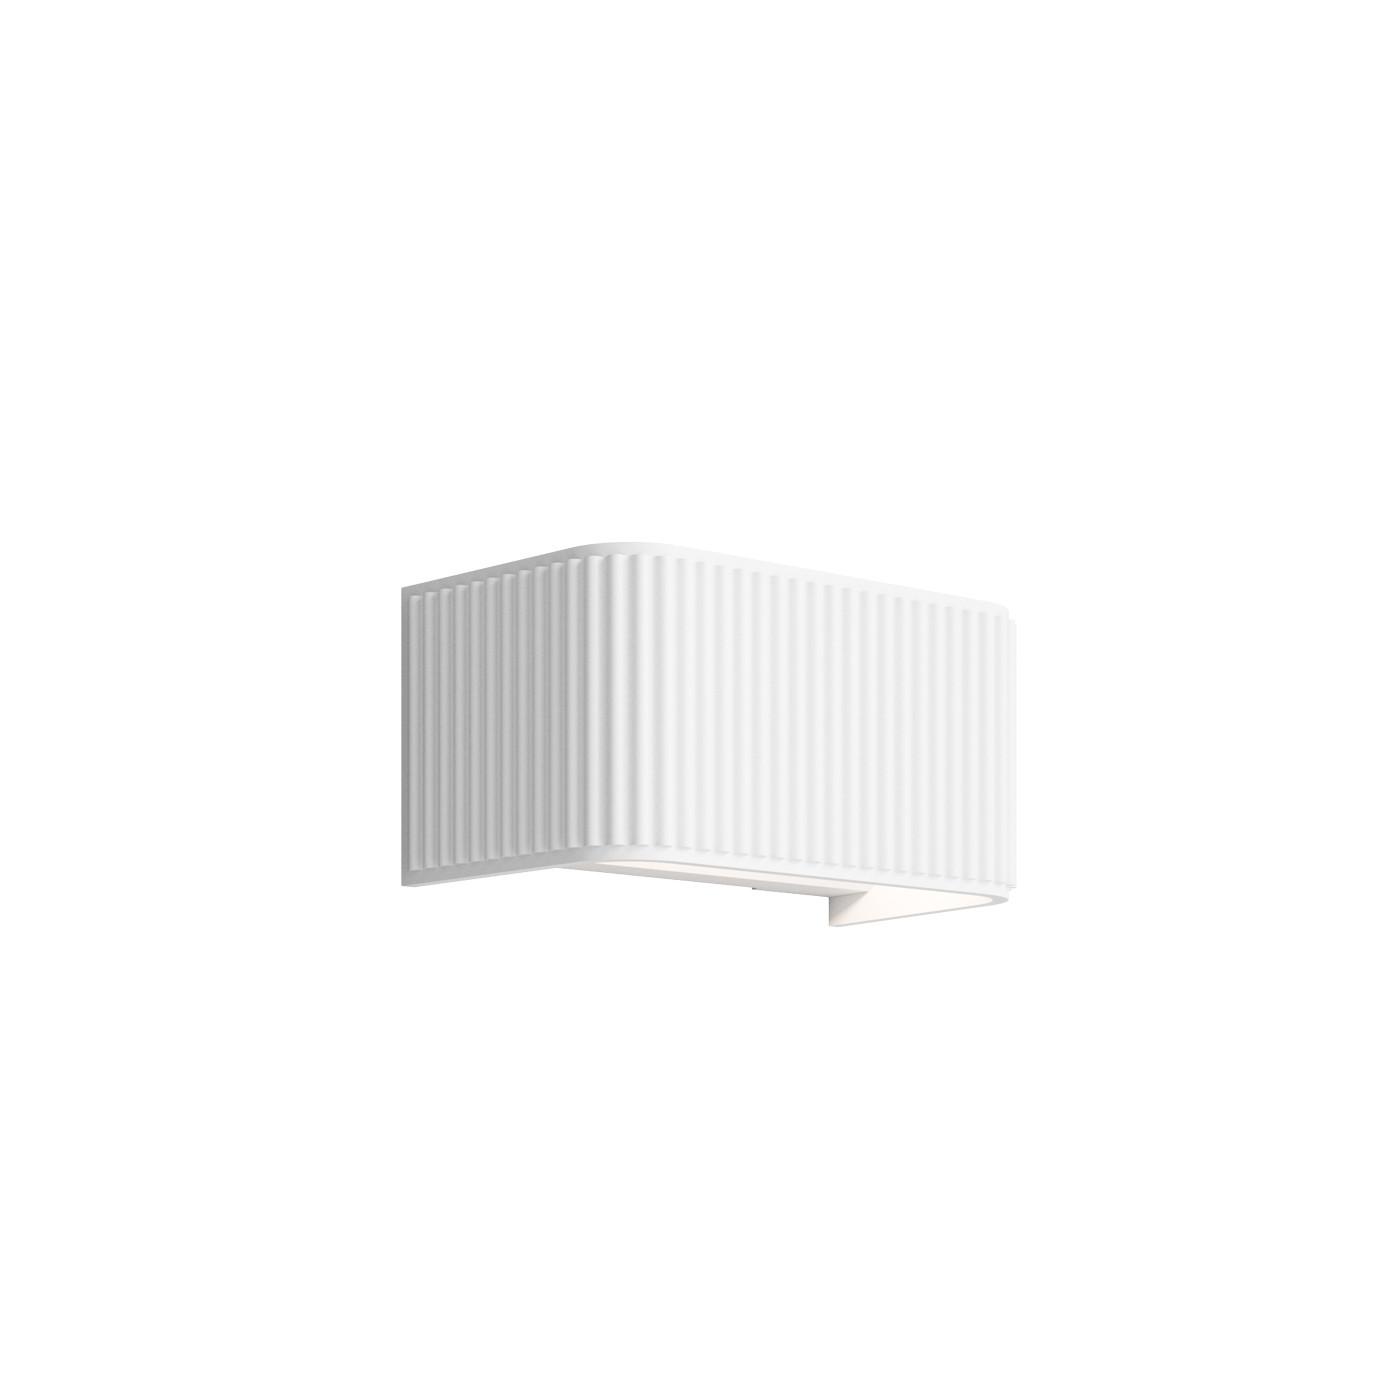 Rotaliana Dresscode W1 LED